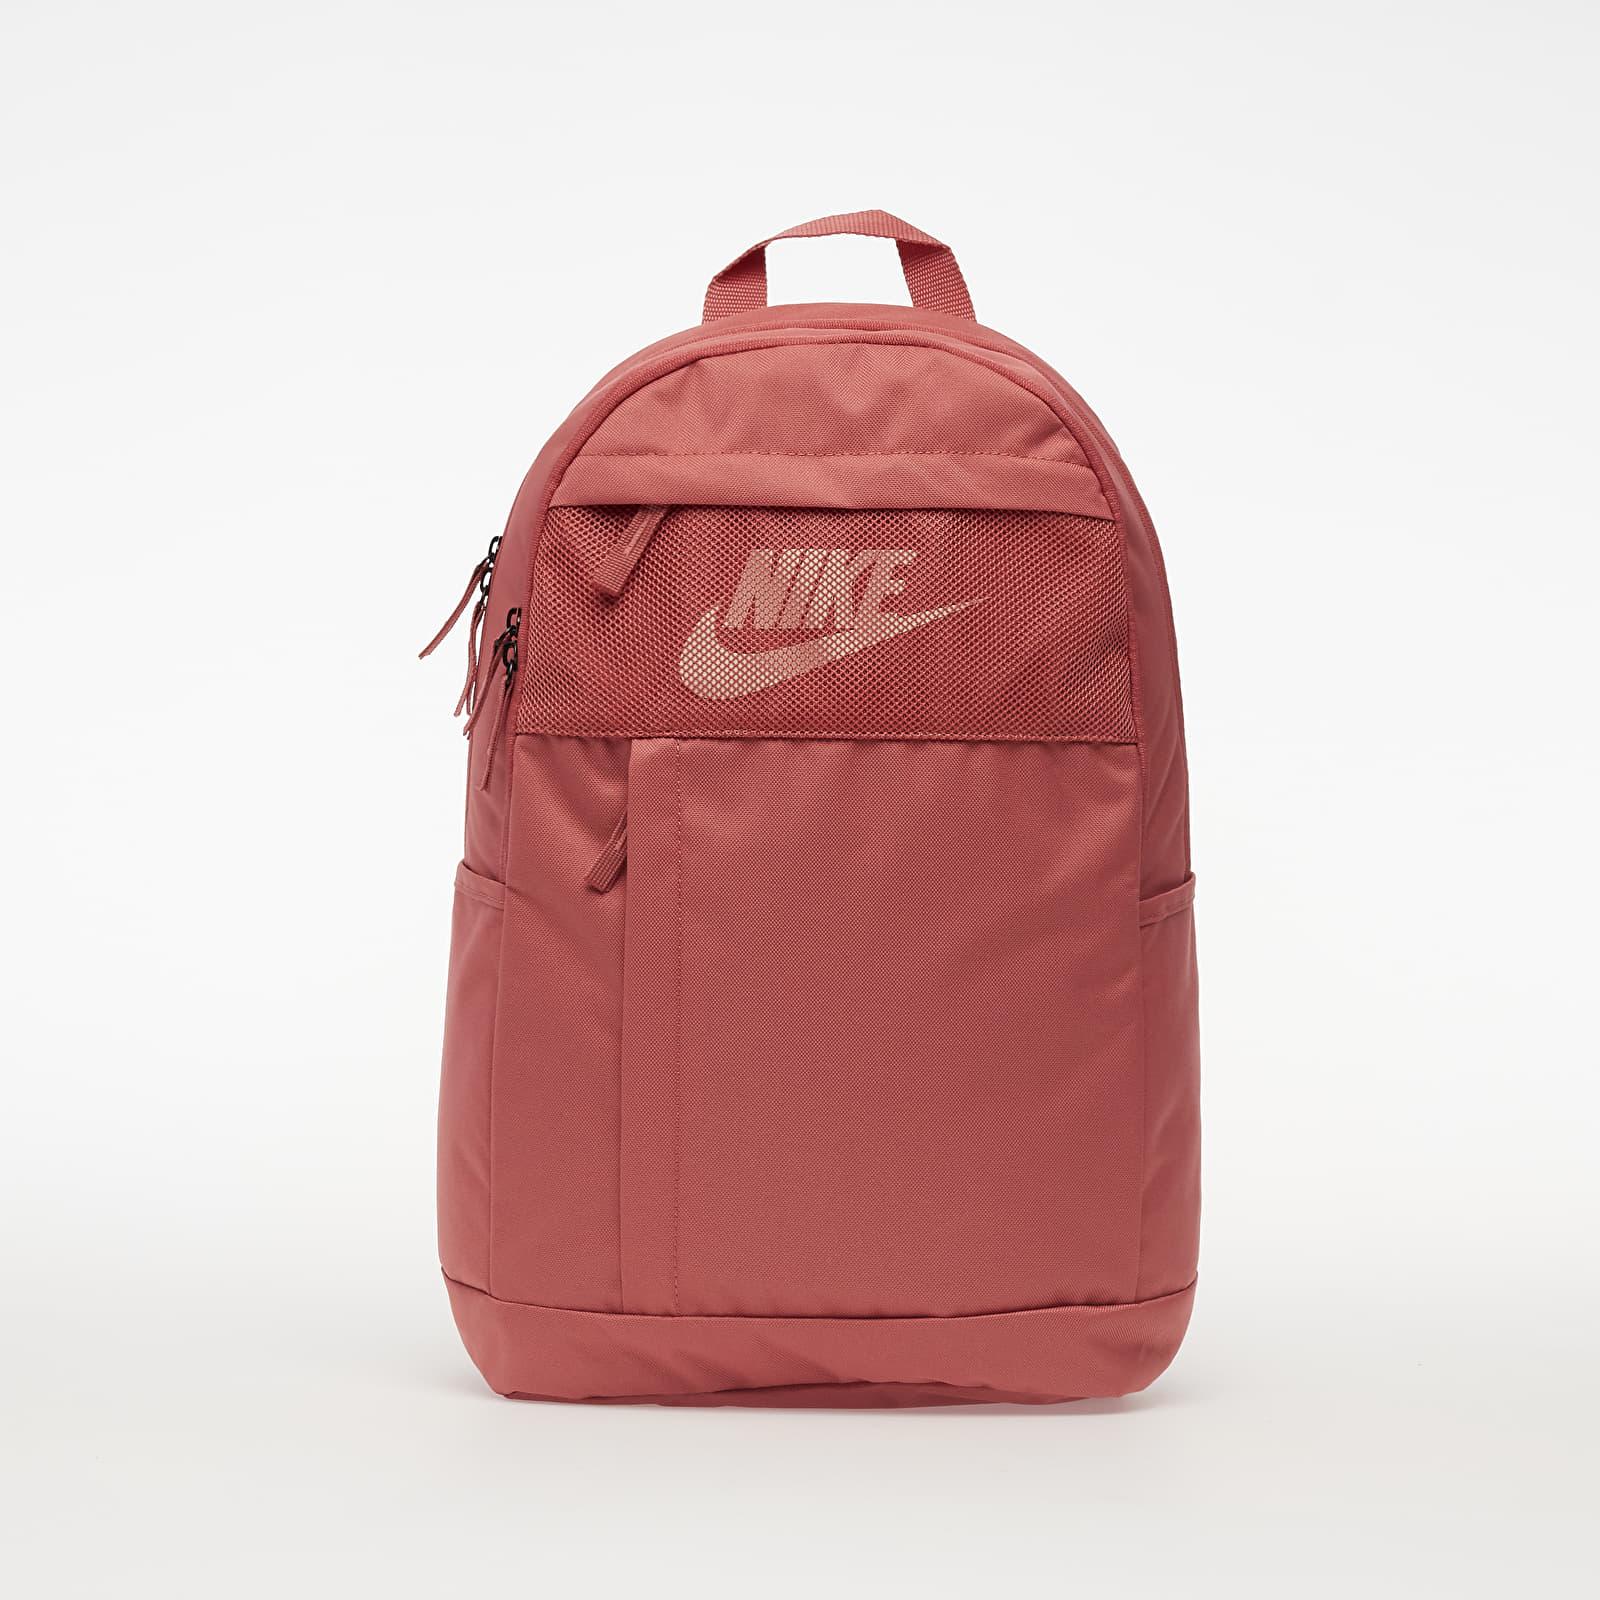 Rucksäcke Nike Elemental Backpack Canyon Pink/ Canyon Pink/ Pale Ivory